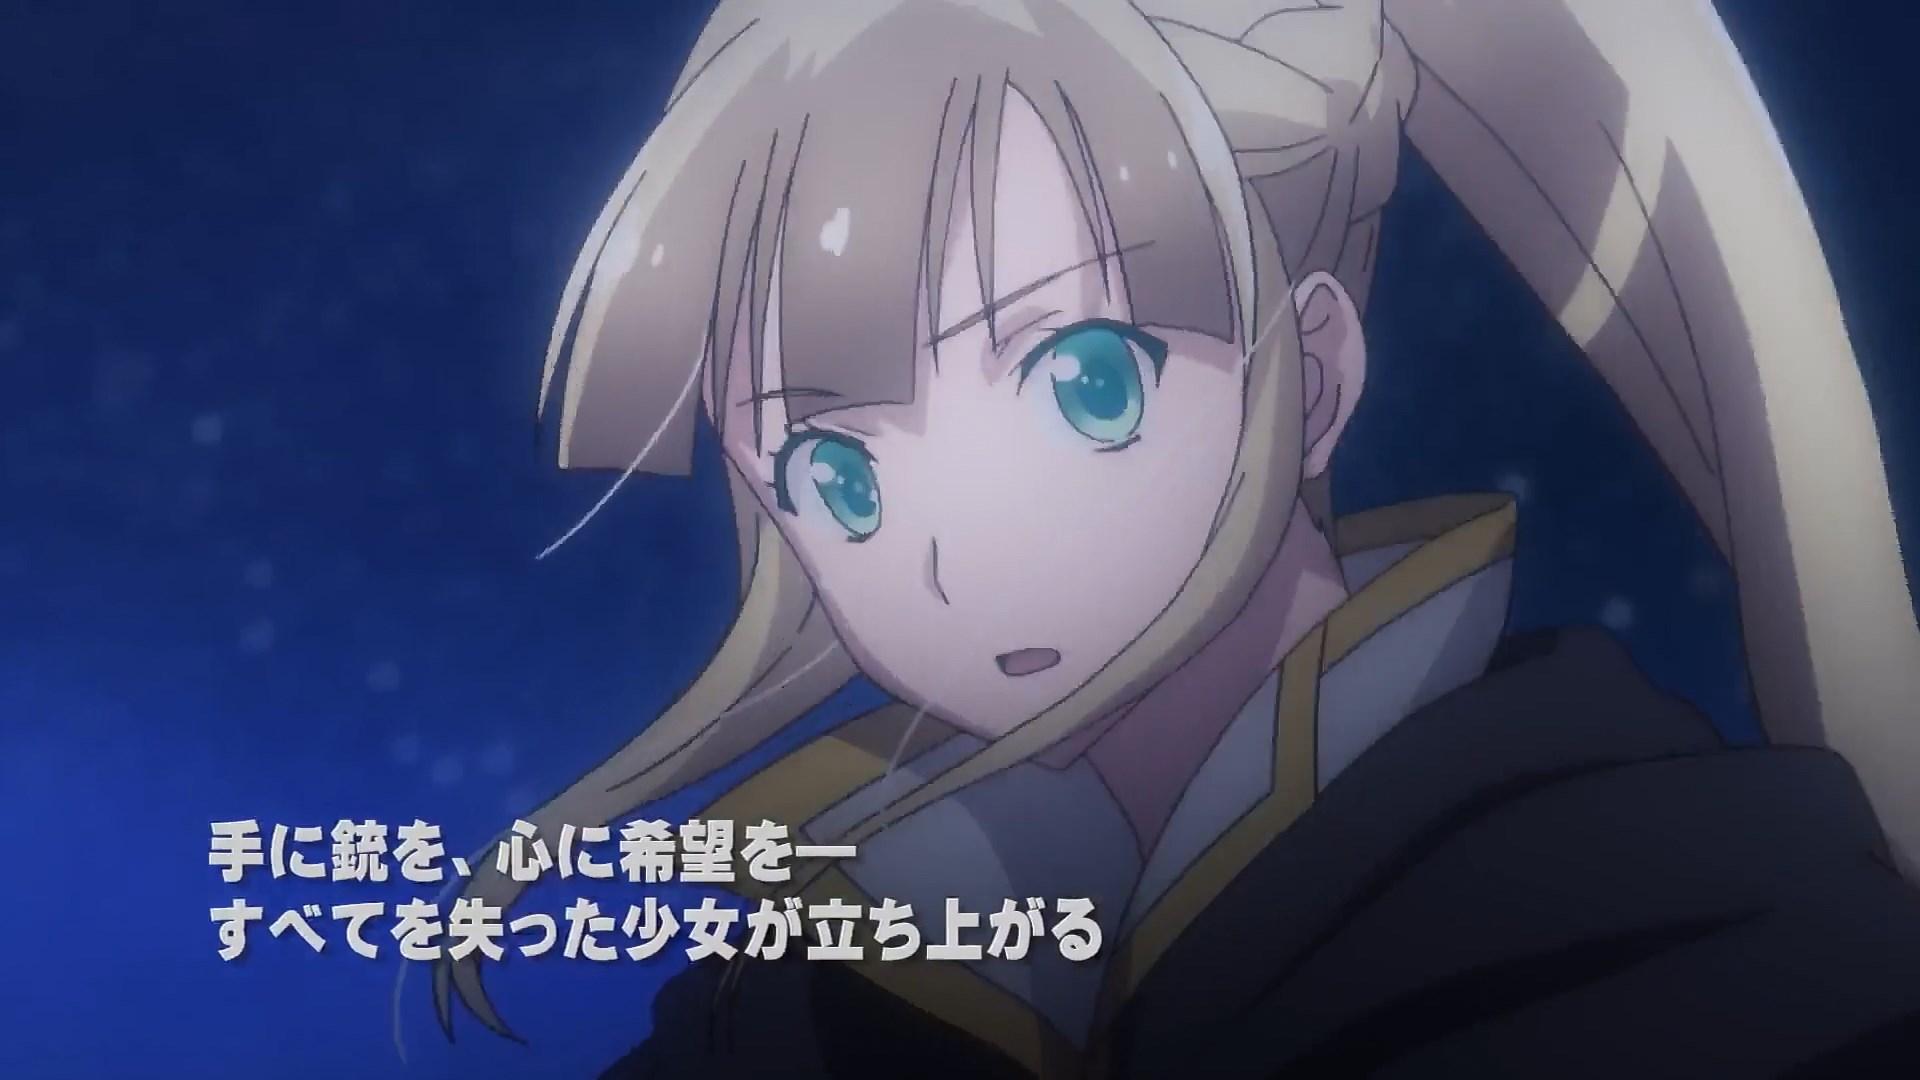 Kohakuiro no Hunter The Animation Episode 1 Preview